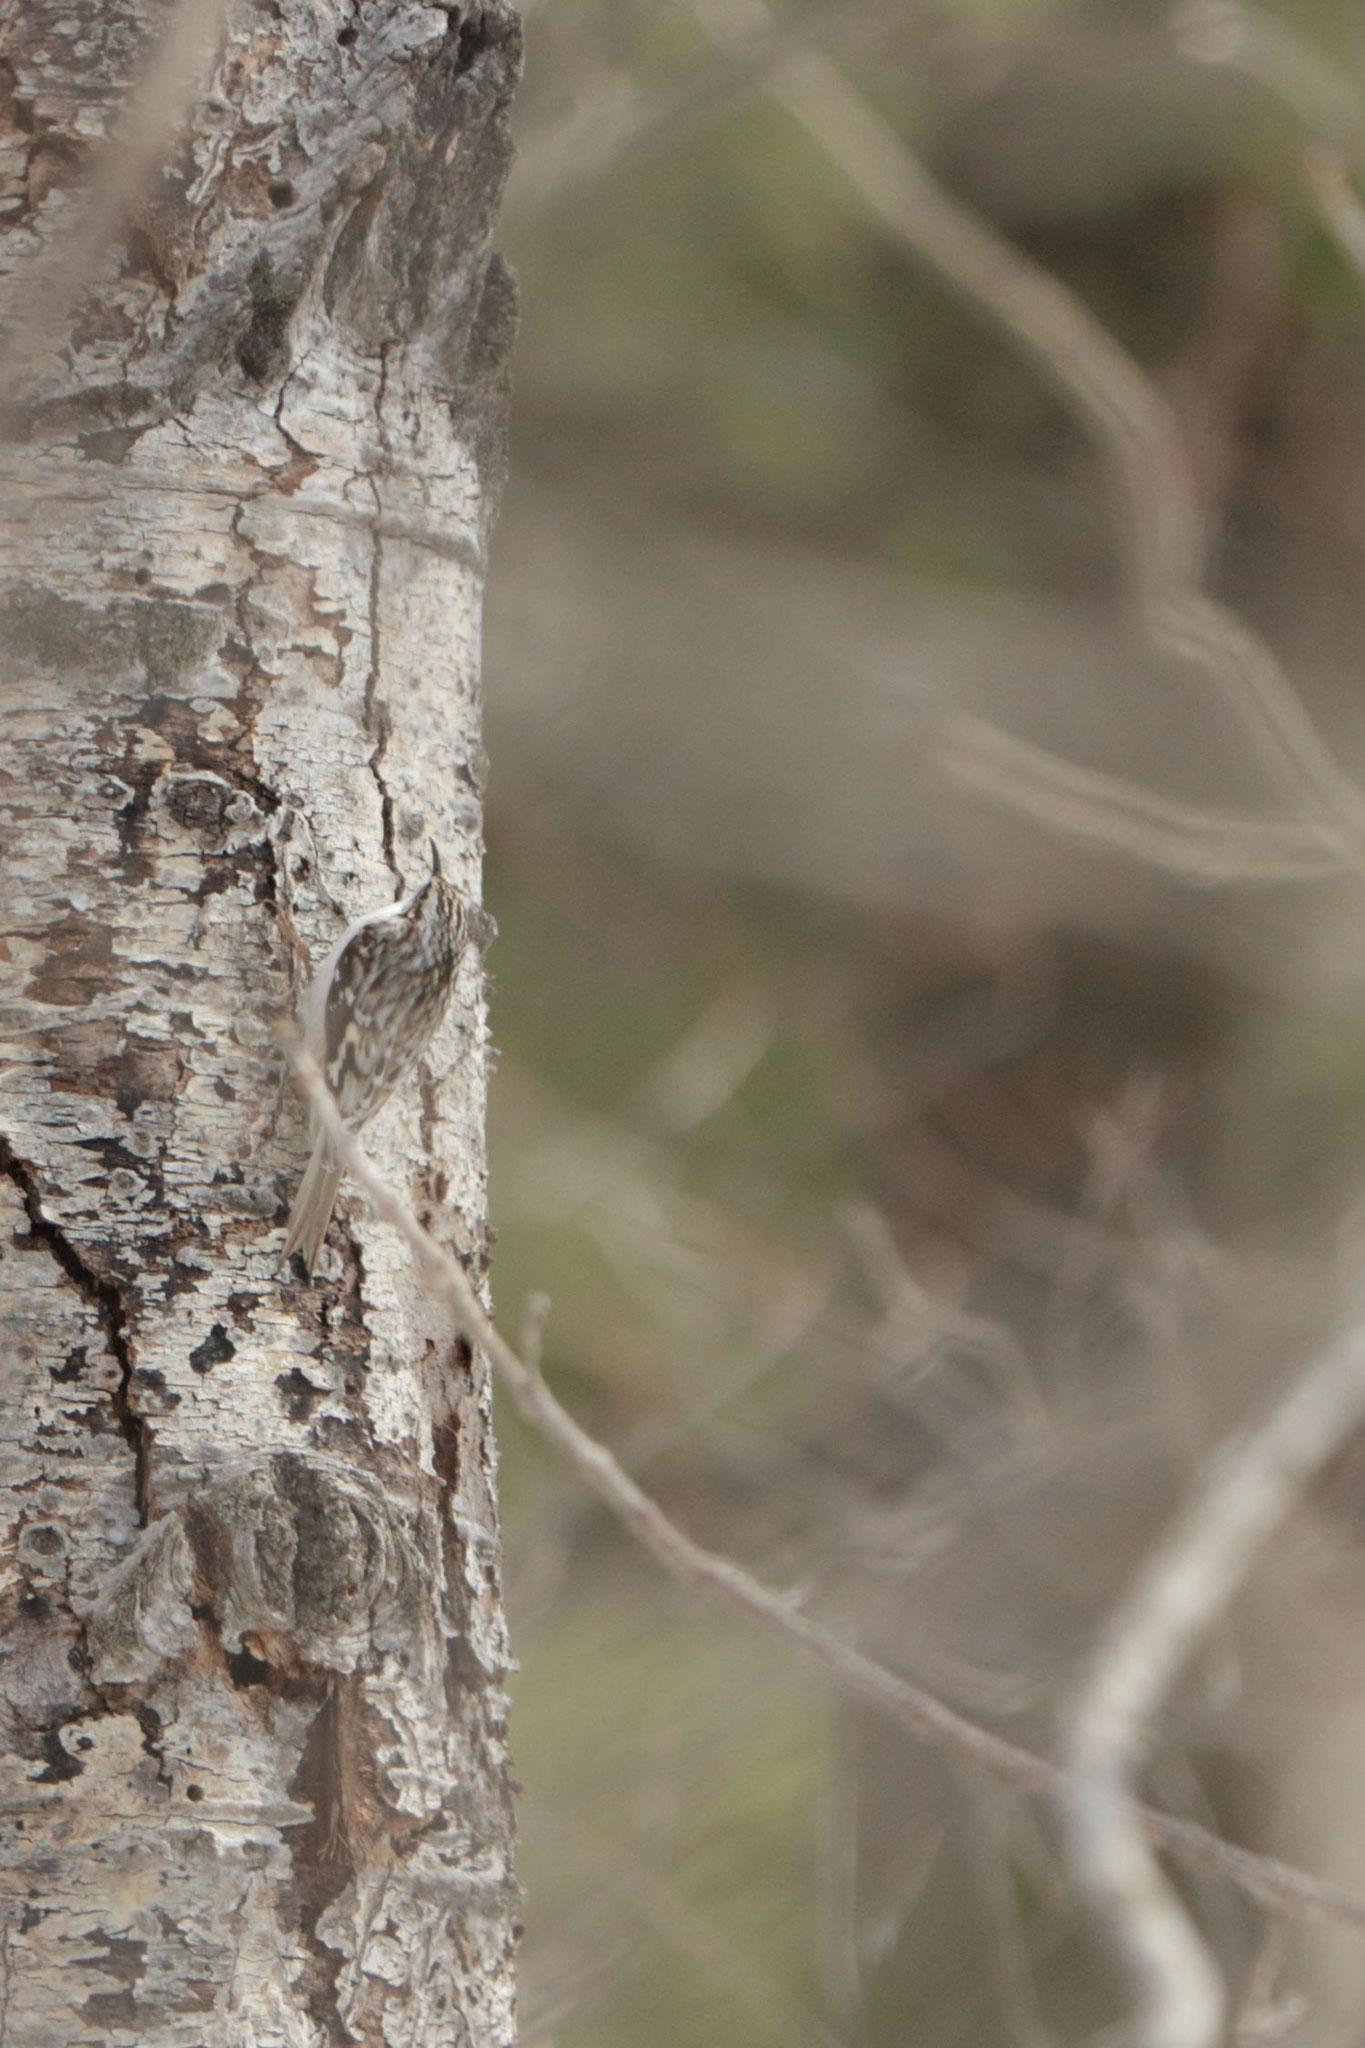 West Rutland Marsh, VT, USA. Canon EOS 80D, EF 70-300mm f/4-5.6 IS II USM à 300mm, f/5,6, 1/400 s, 1000 ISO